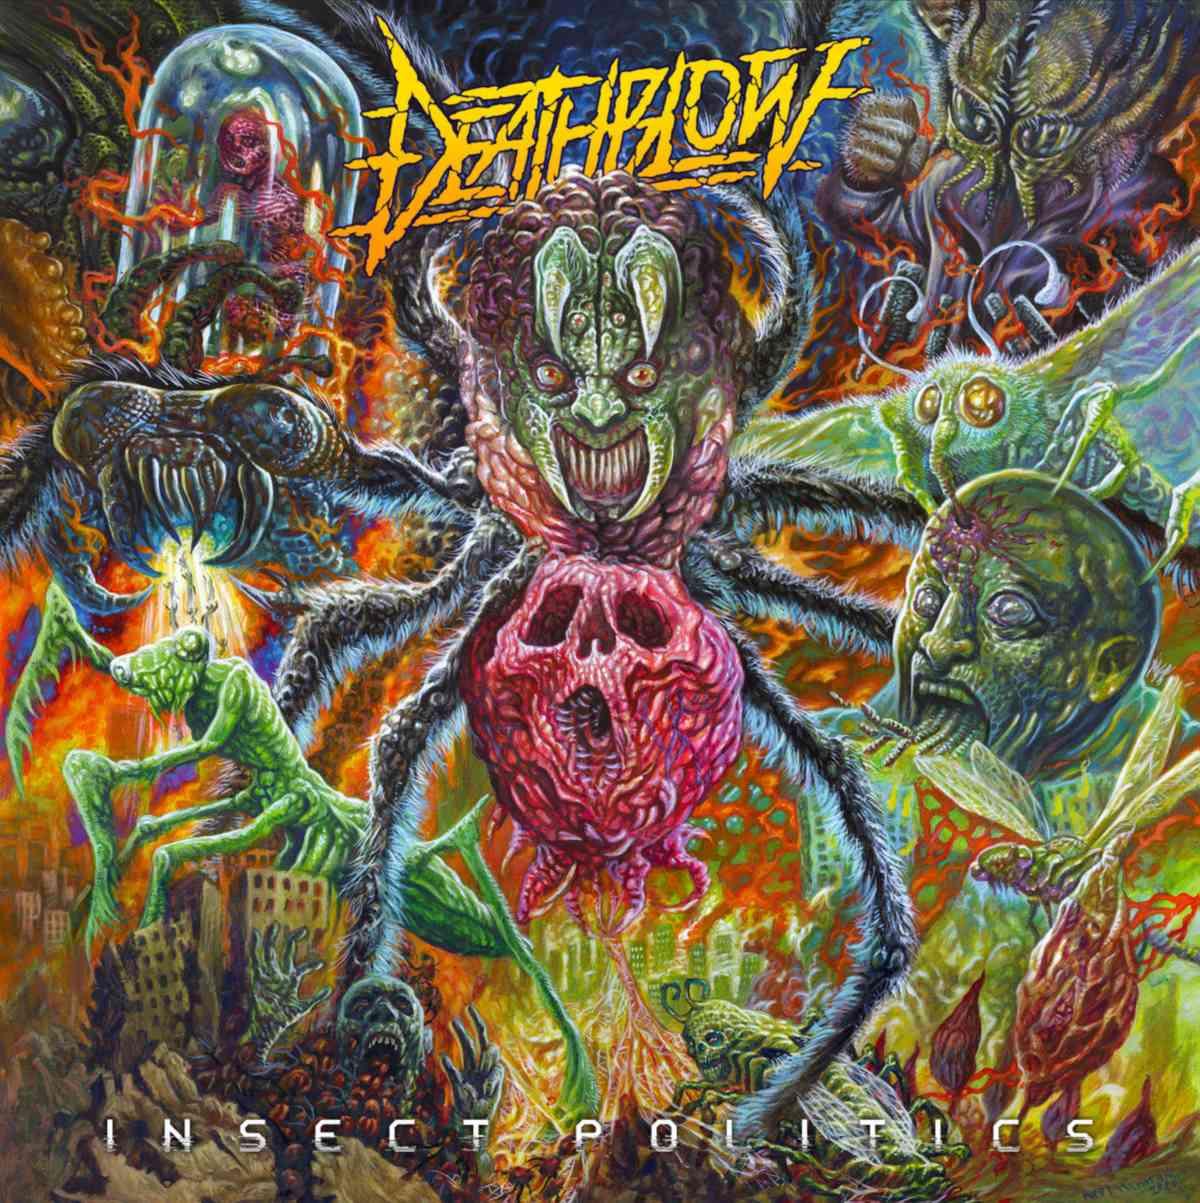 Deathblow - Insect Politics - album cover